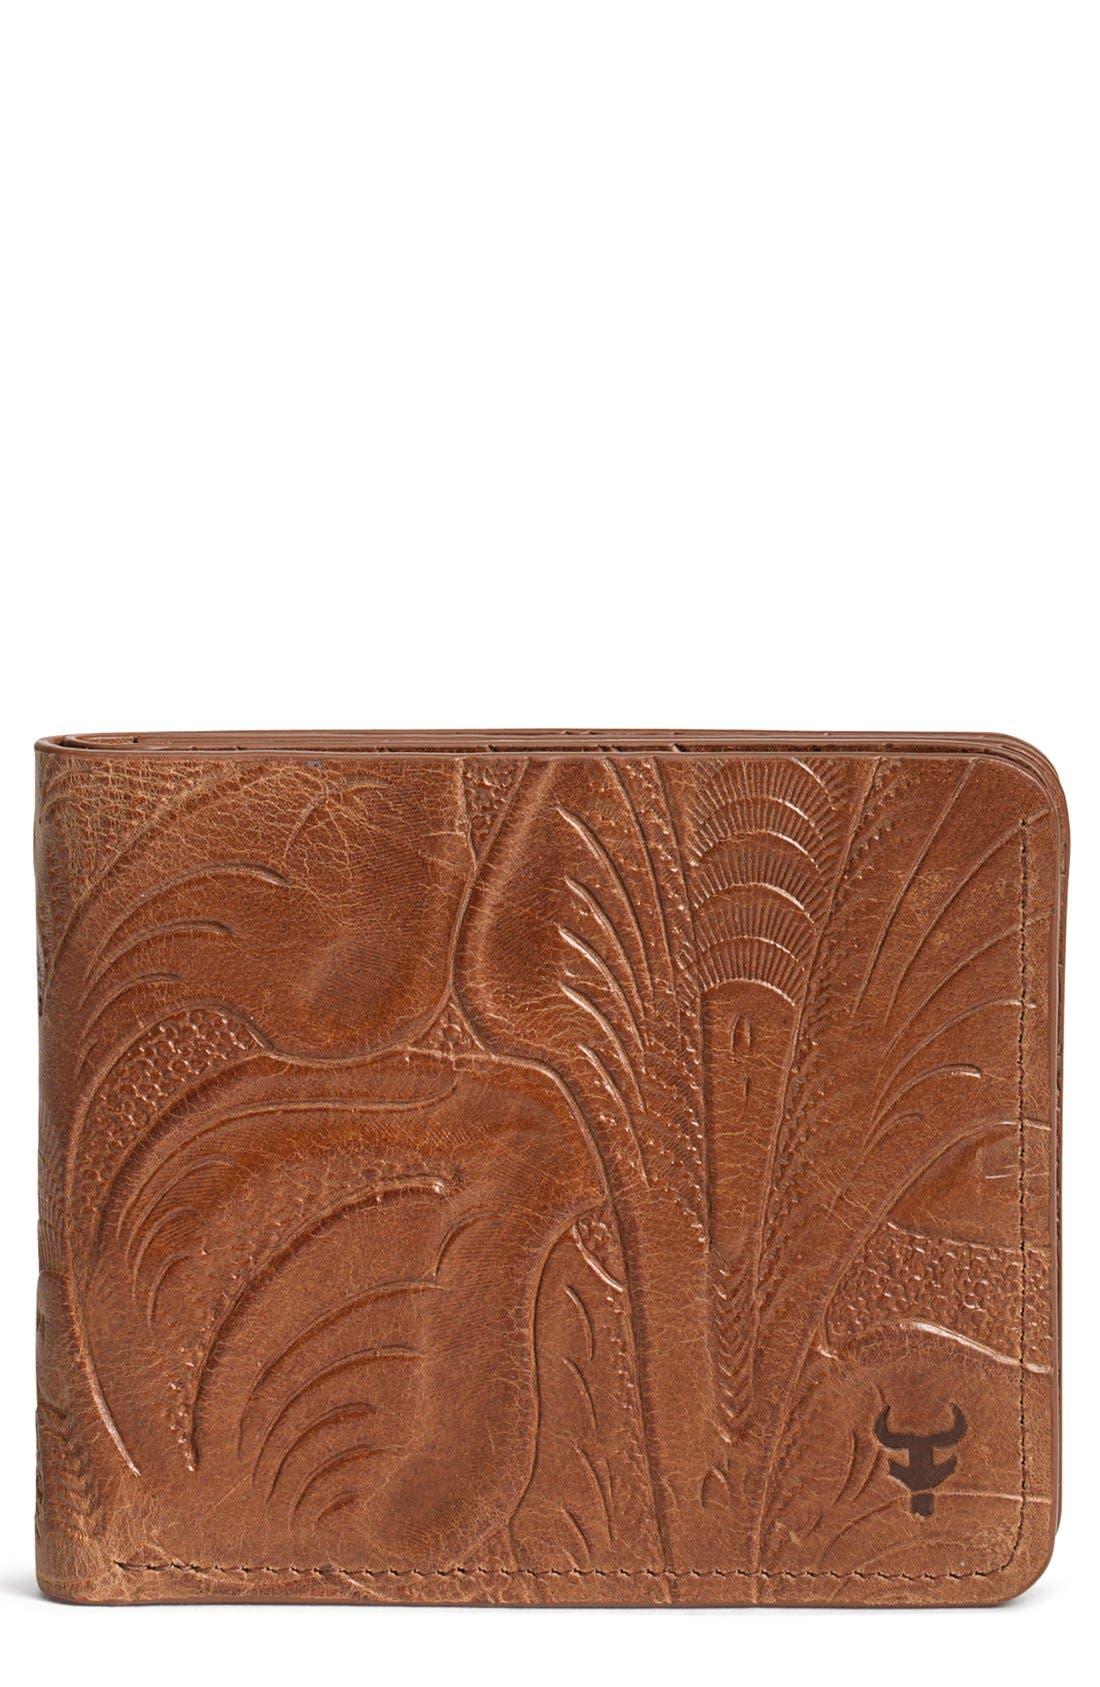 'Jackson' Slimfold Italian Steer Leather Wallet,                         Main,                         color, TAN